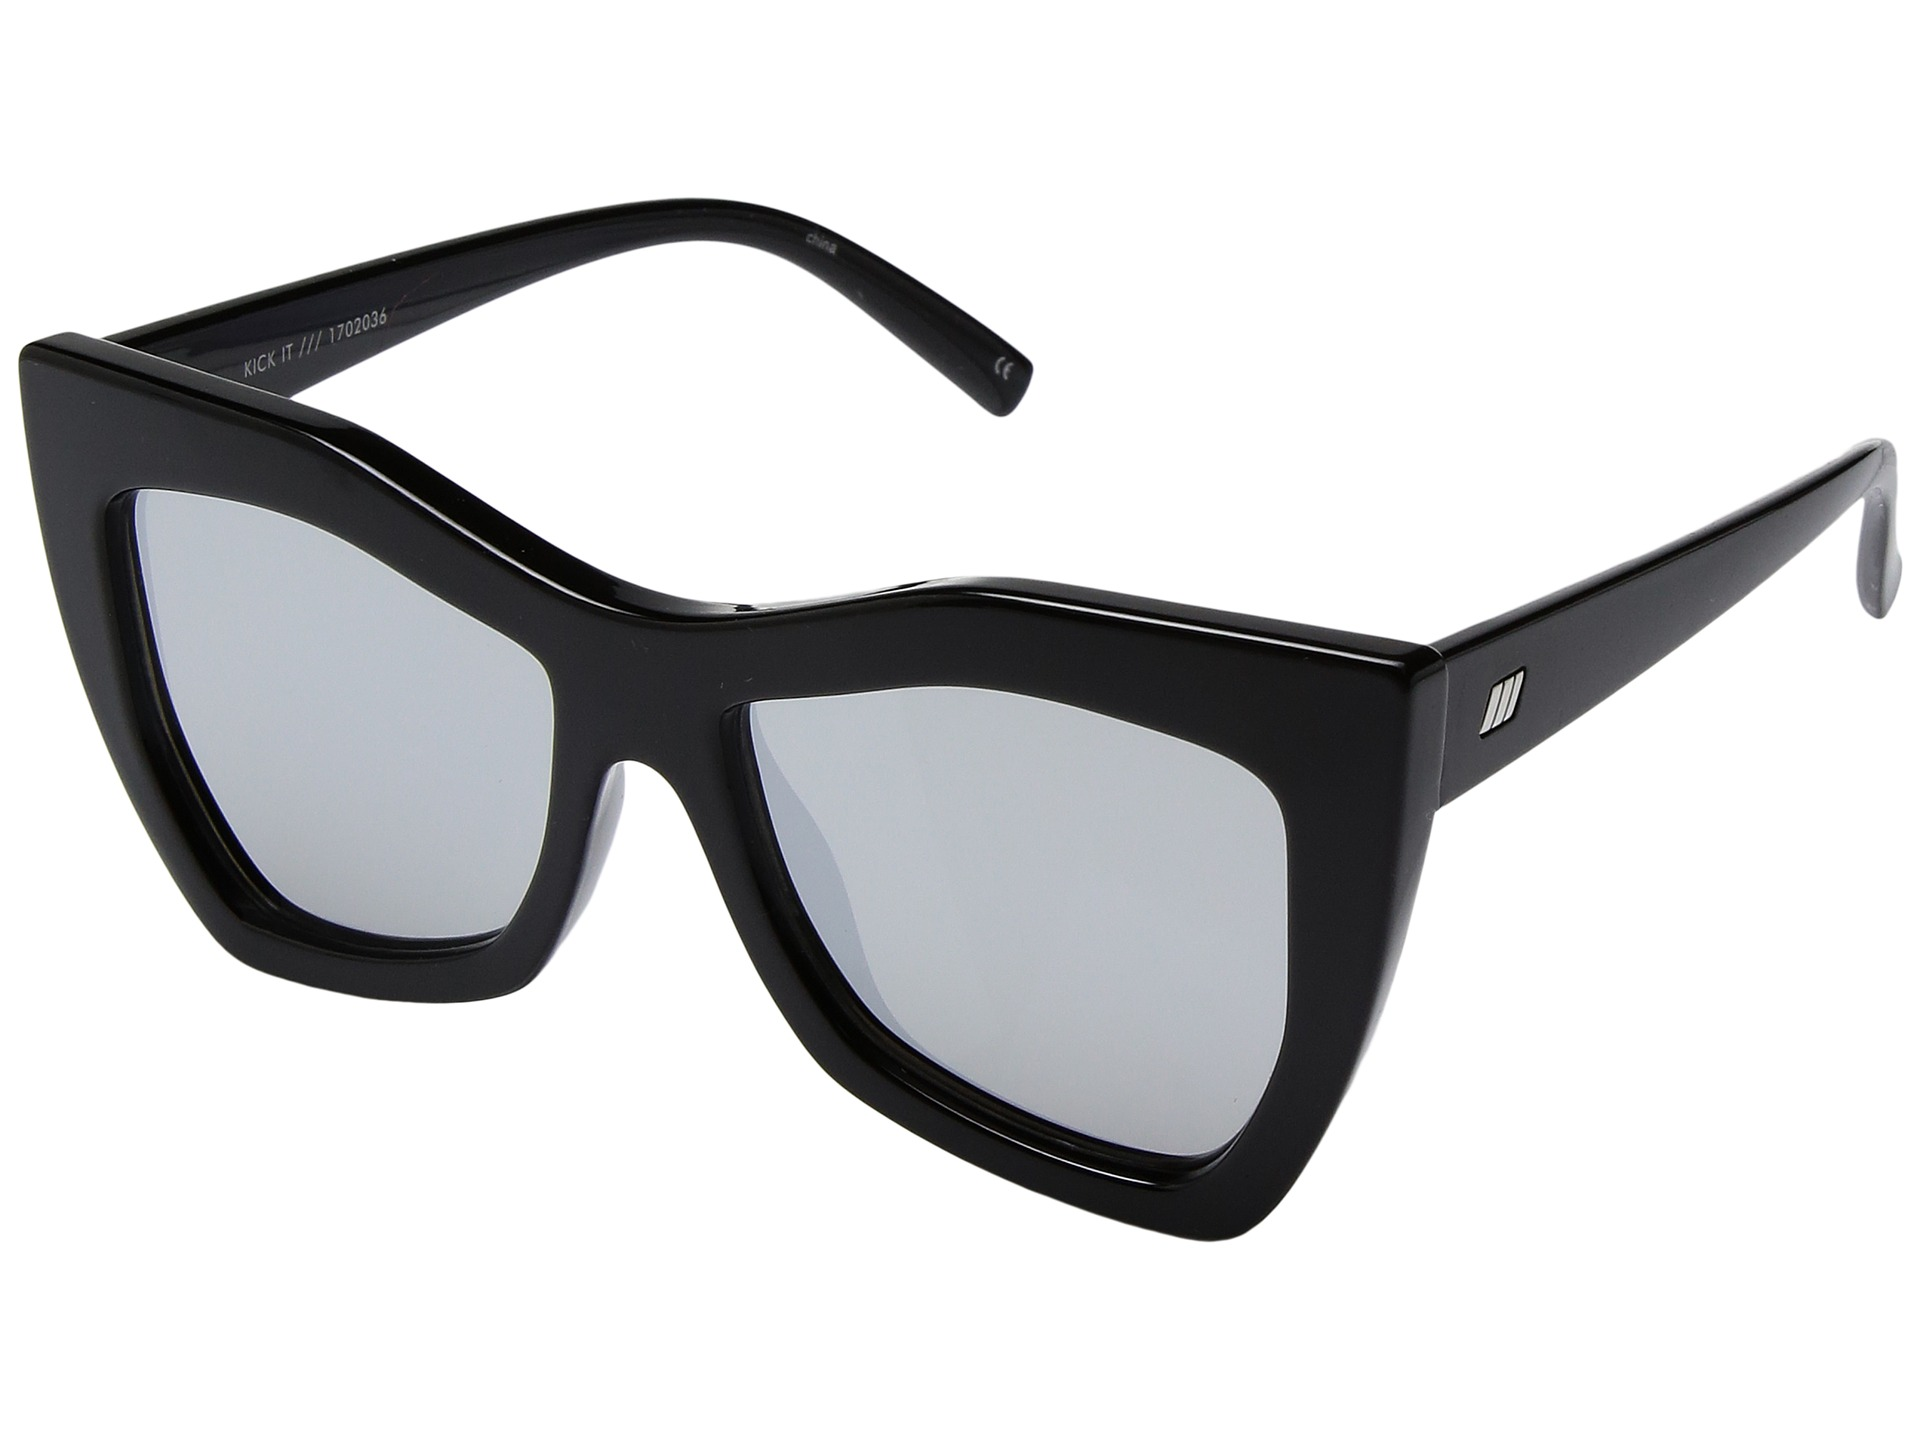 Le Specs Kick It